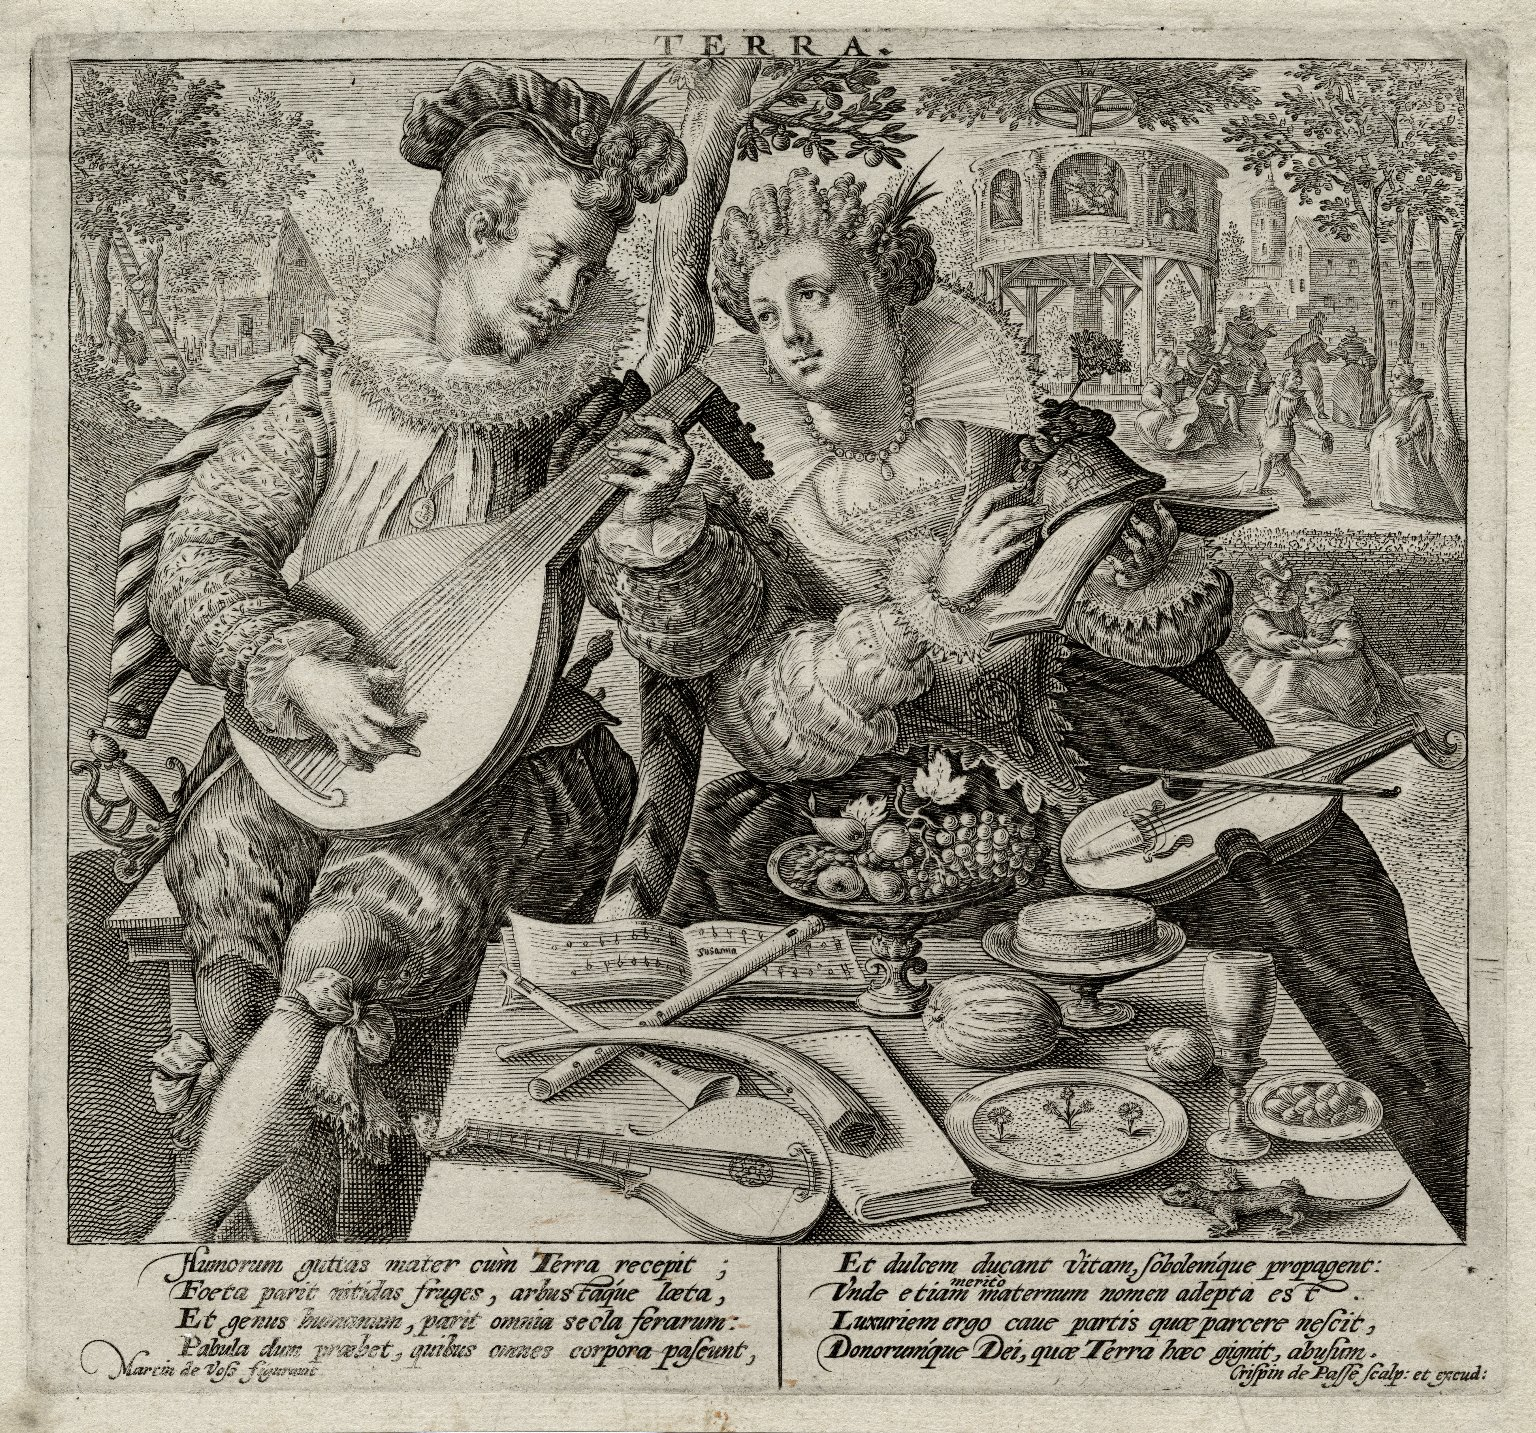 Terra [graphic] / Martin de Voss figurauit ; Crispin de Passe scalp. [sic] et excud.